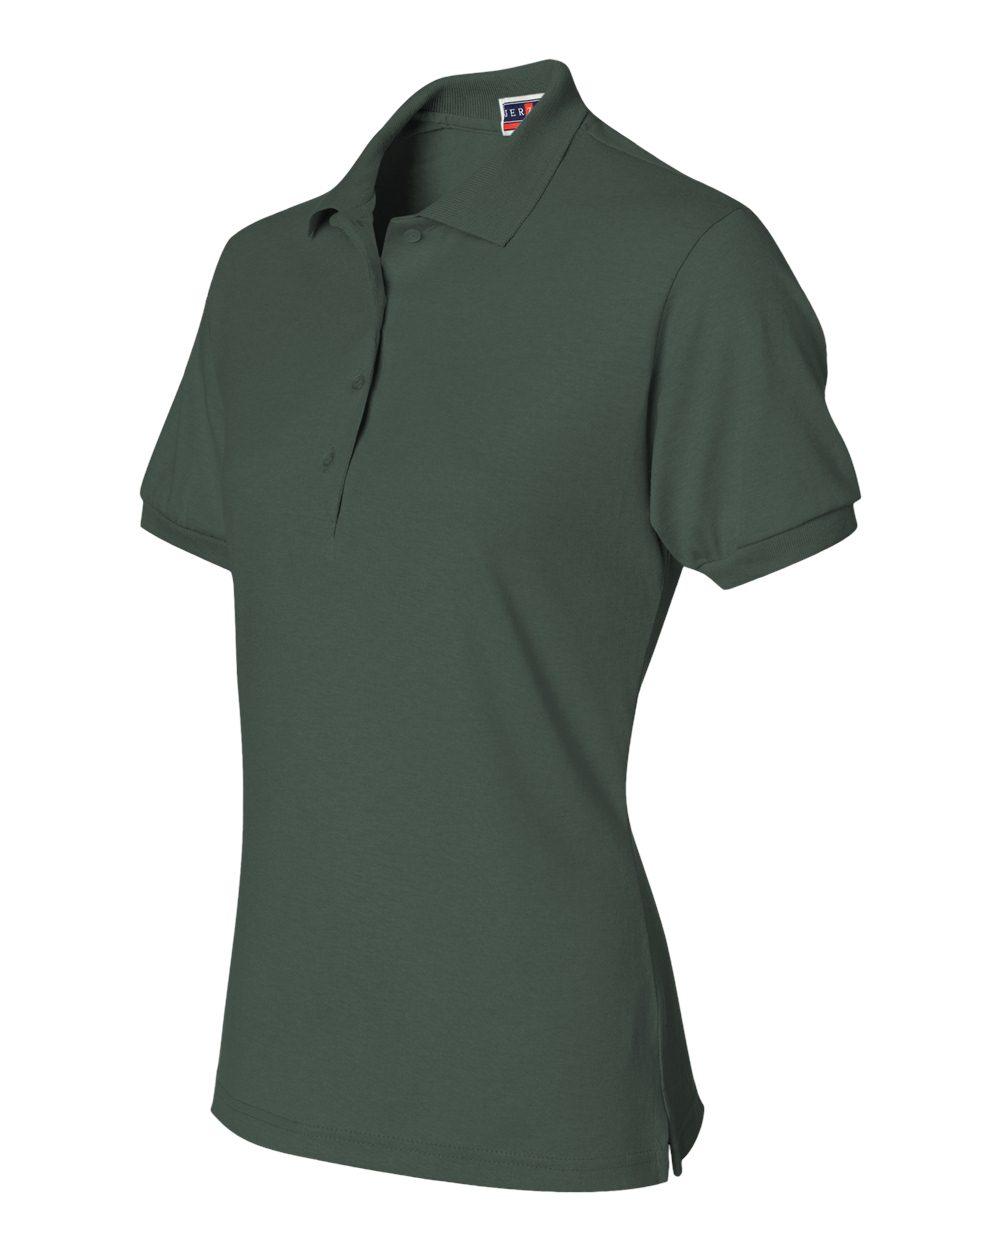 Jerzees-Womens-5-6-oz-50-50-Jersey-Polo-with-Spot-Shield-437W-Size-S-2XL thumbnail 25